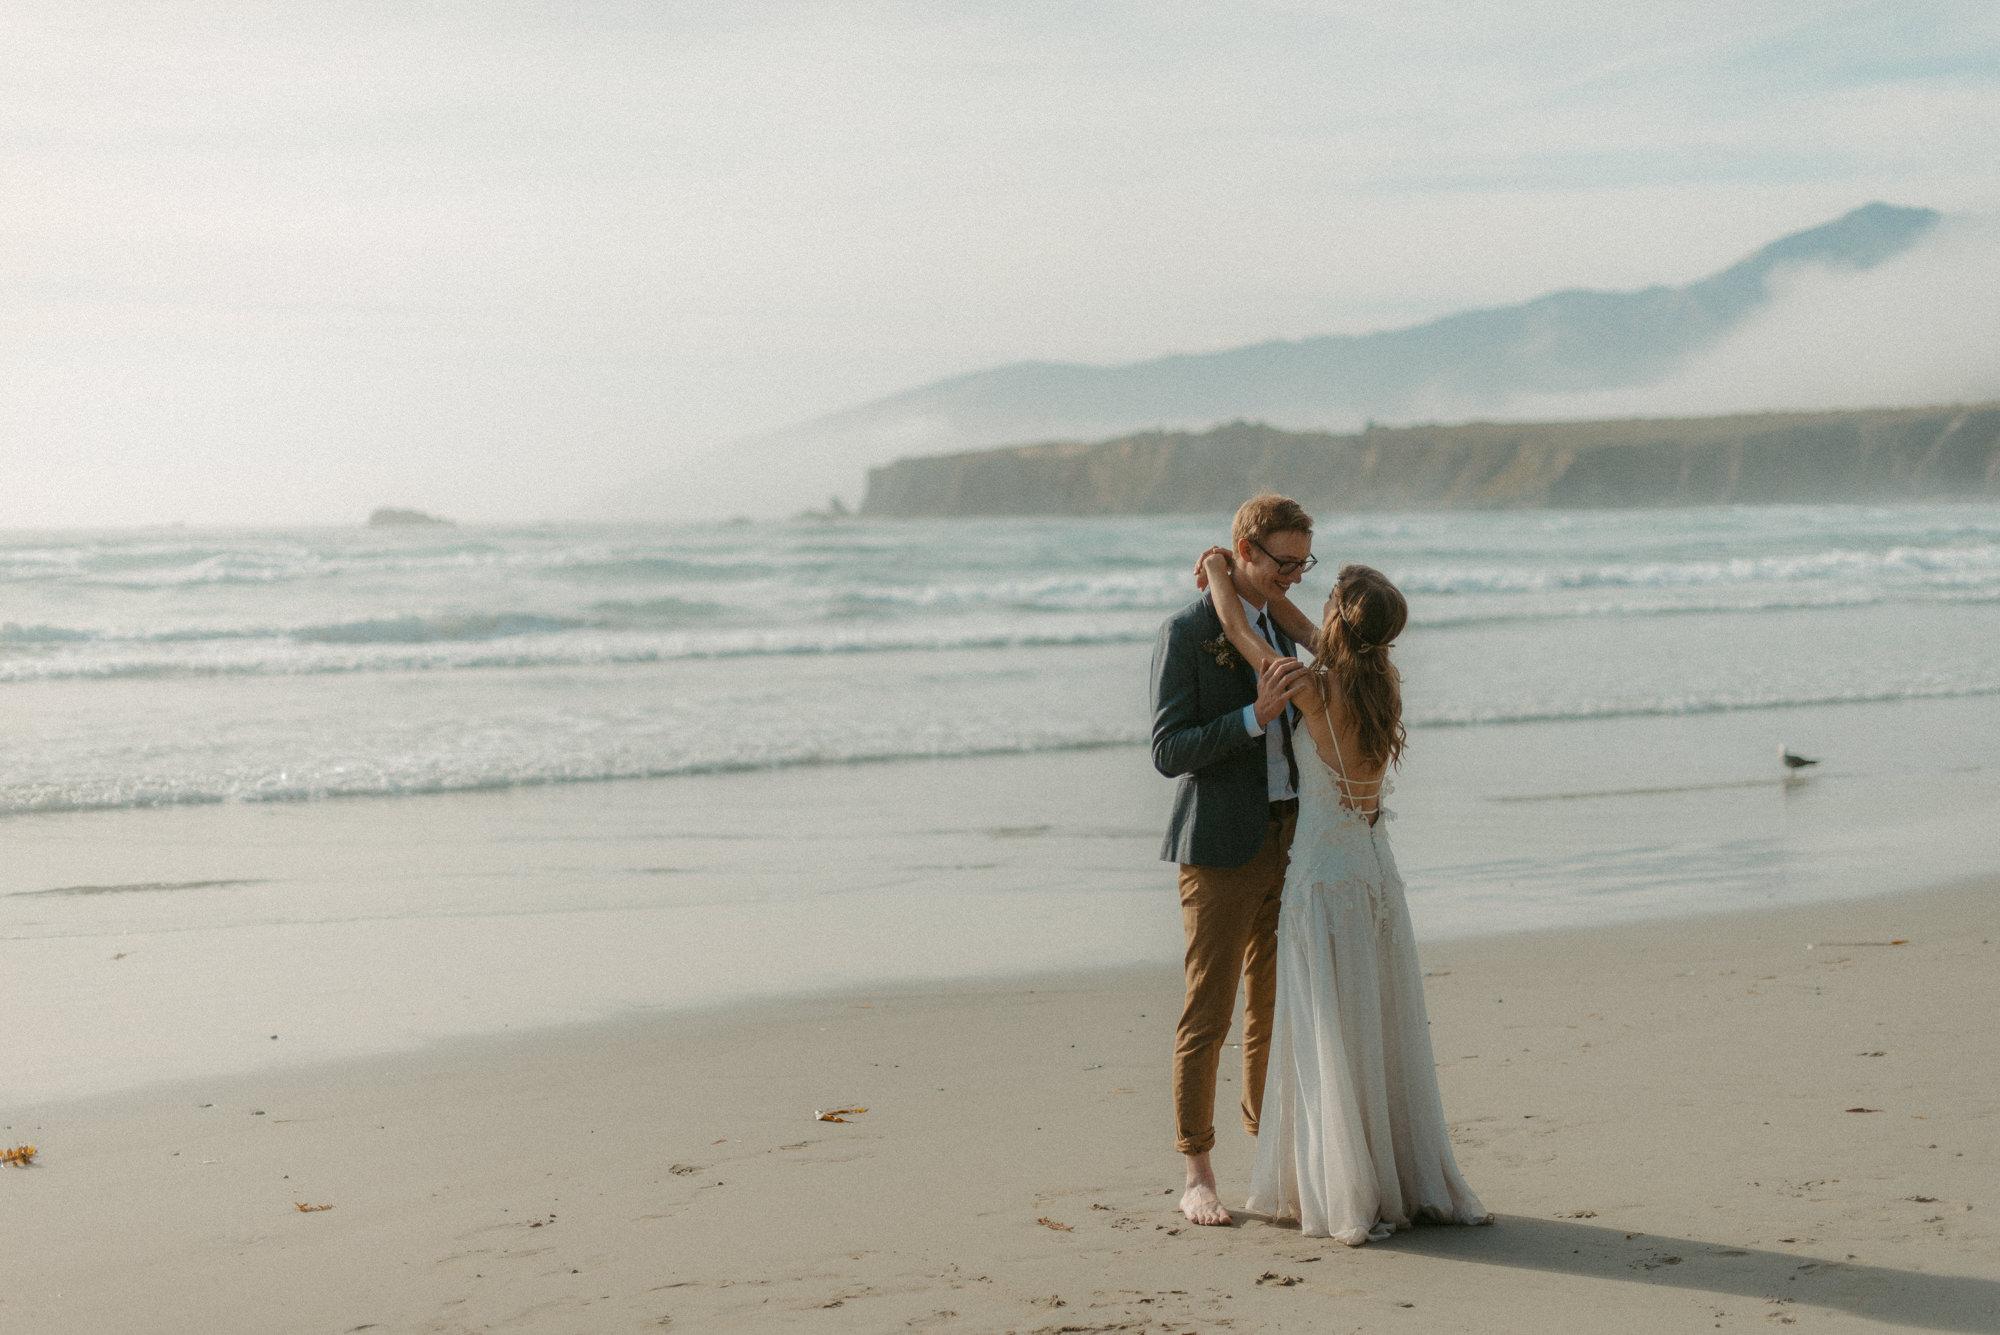 big-sur-adventure-elopement-photographer-74.jpg